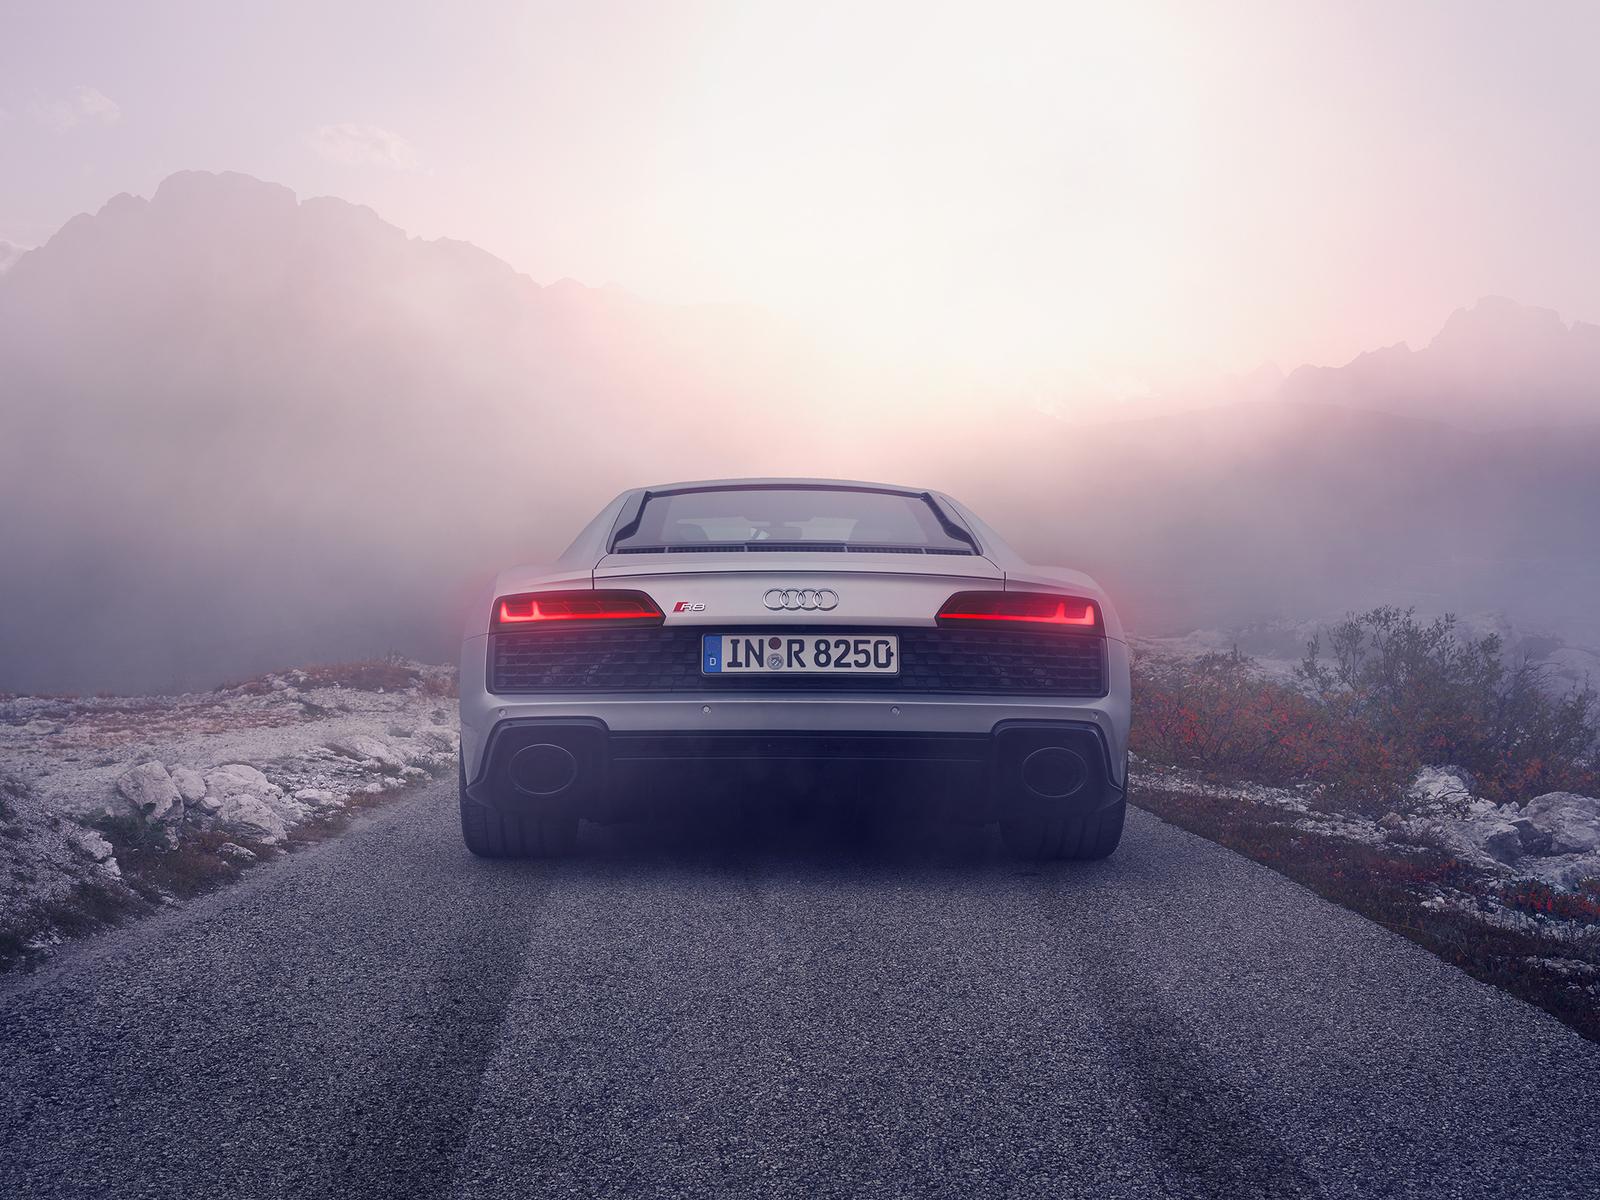 silver-audi-r8-2019-rear-p3.jpg